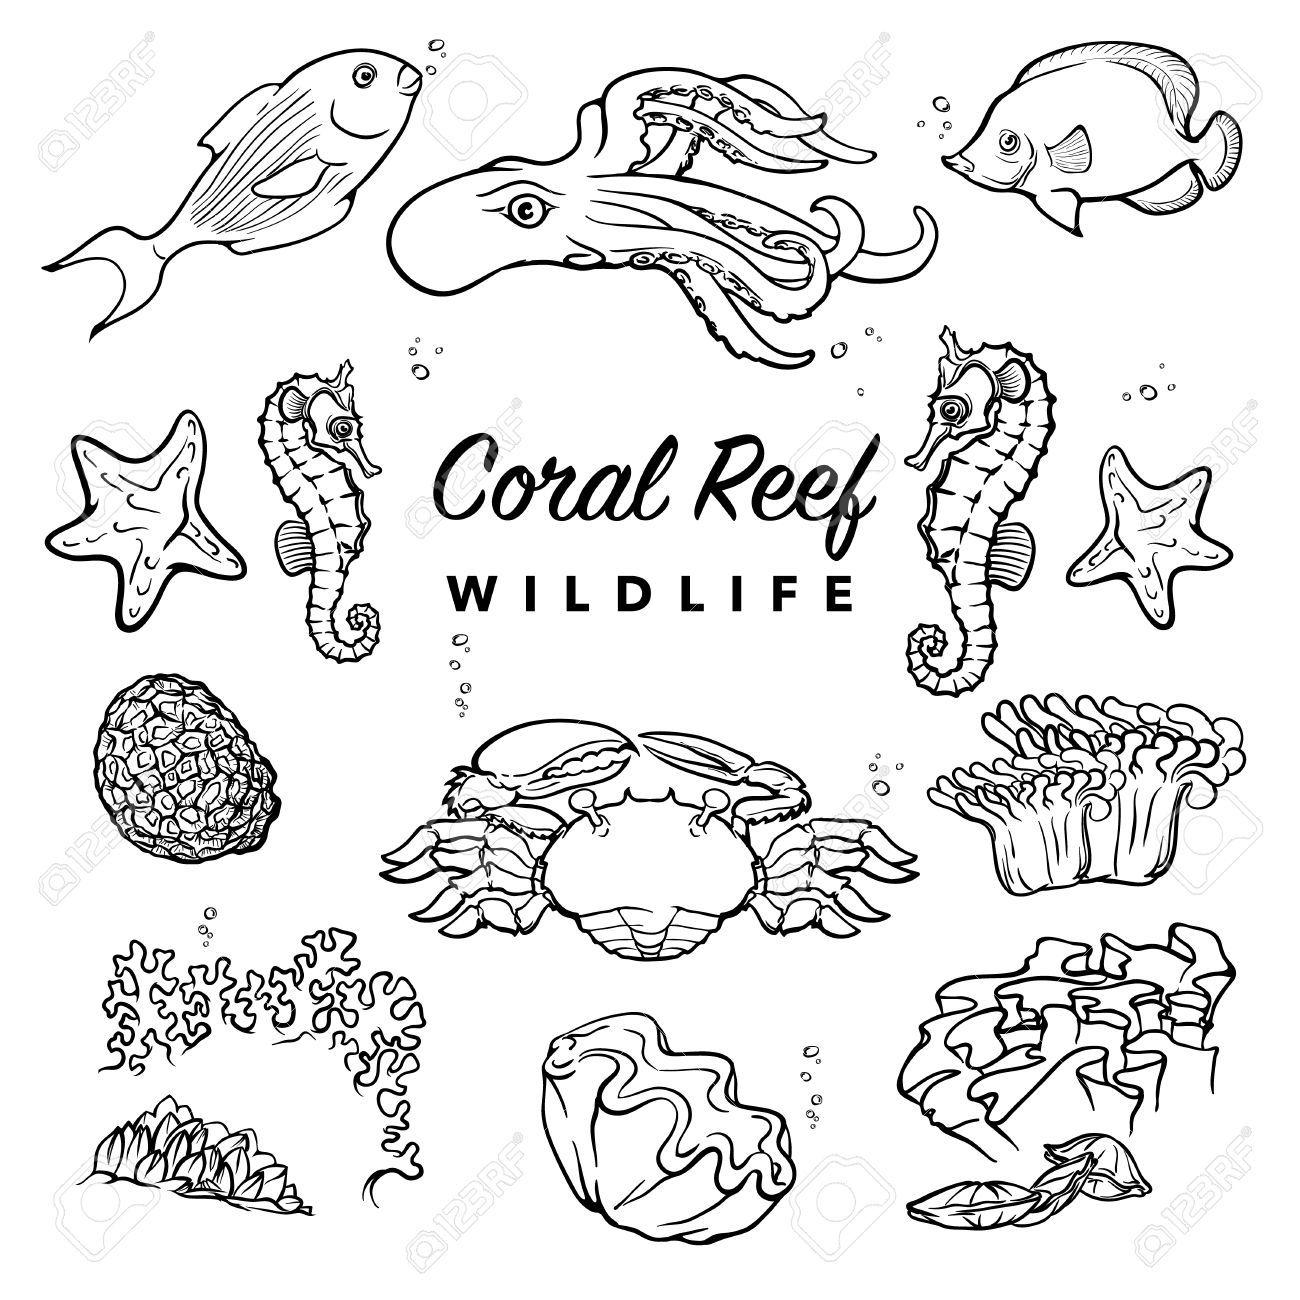 Coral Reef Inhabitants Sea Creatures Coral Reef Drawing Sea Creatures Drawing Coral Reef